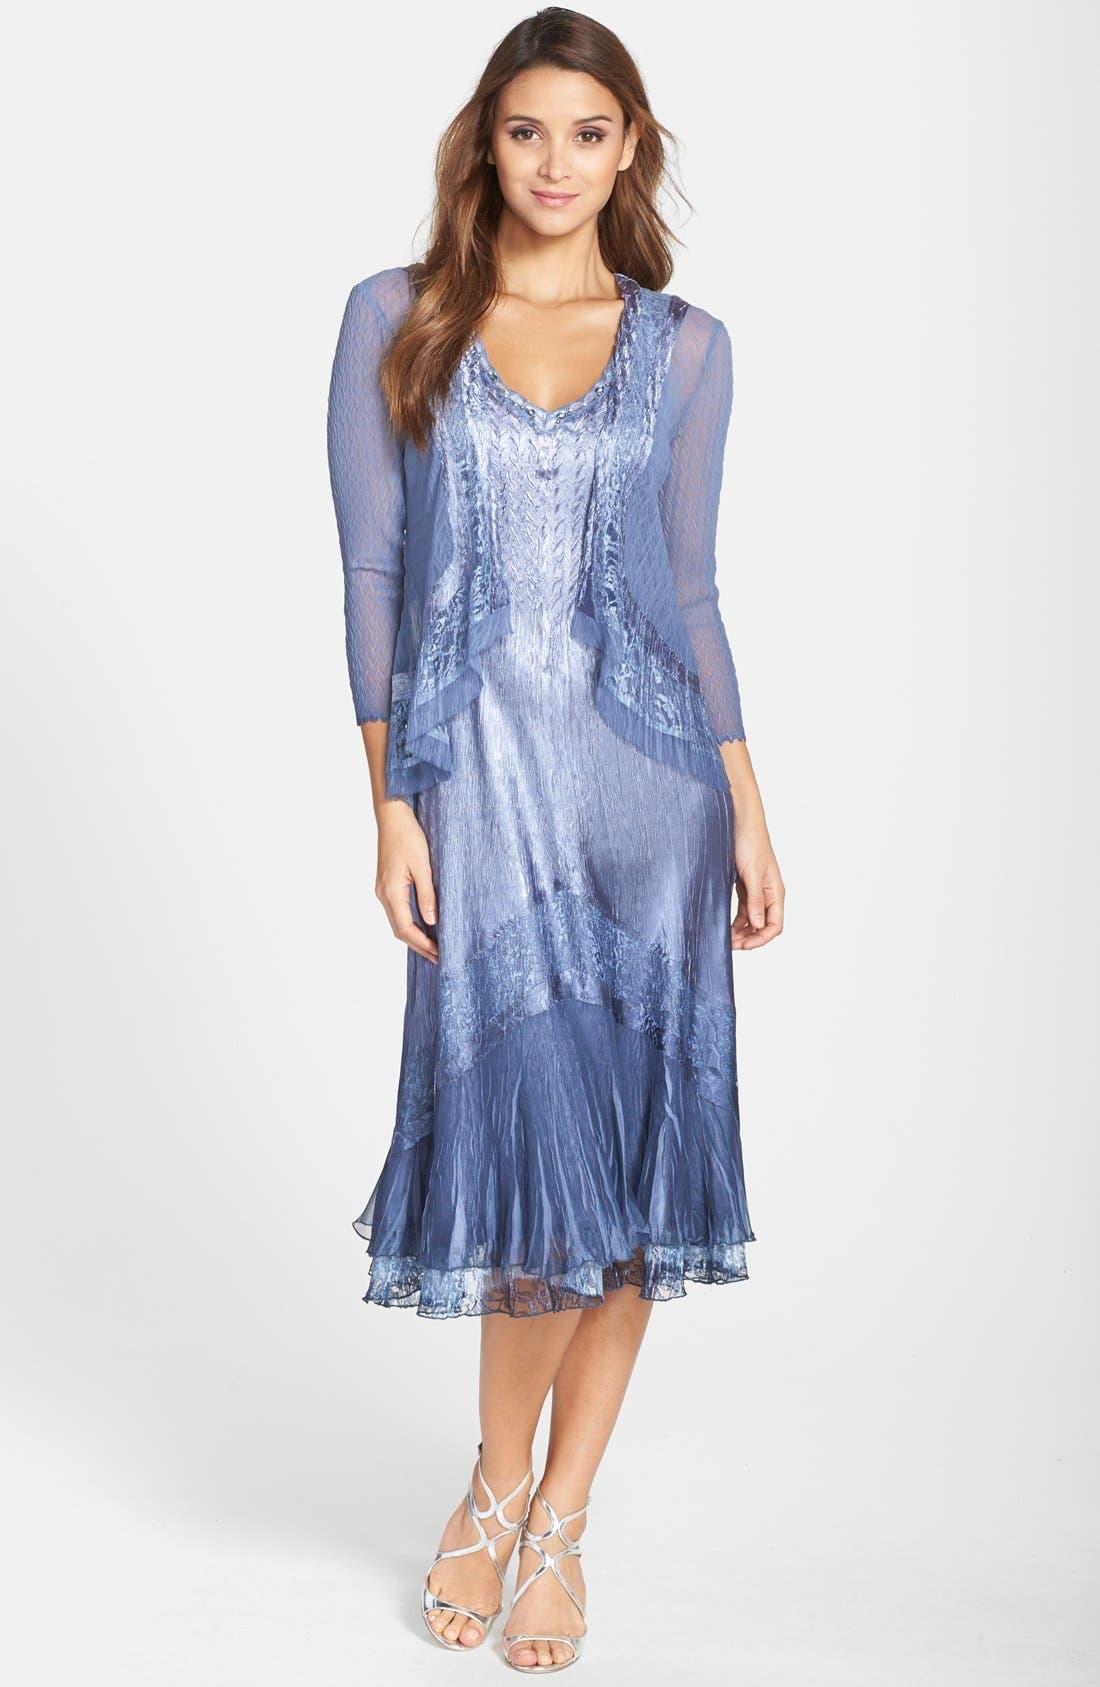 KOMAROV Embellished Lace Trim Charmeuse Dress & Jacket, Main, color, 500